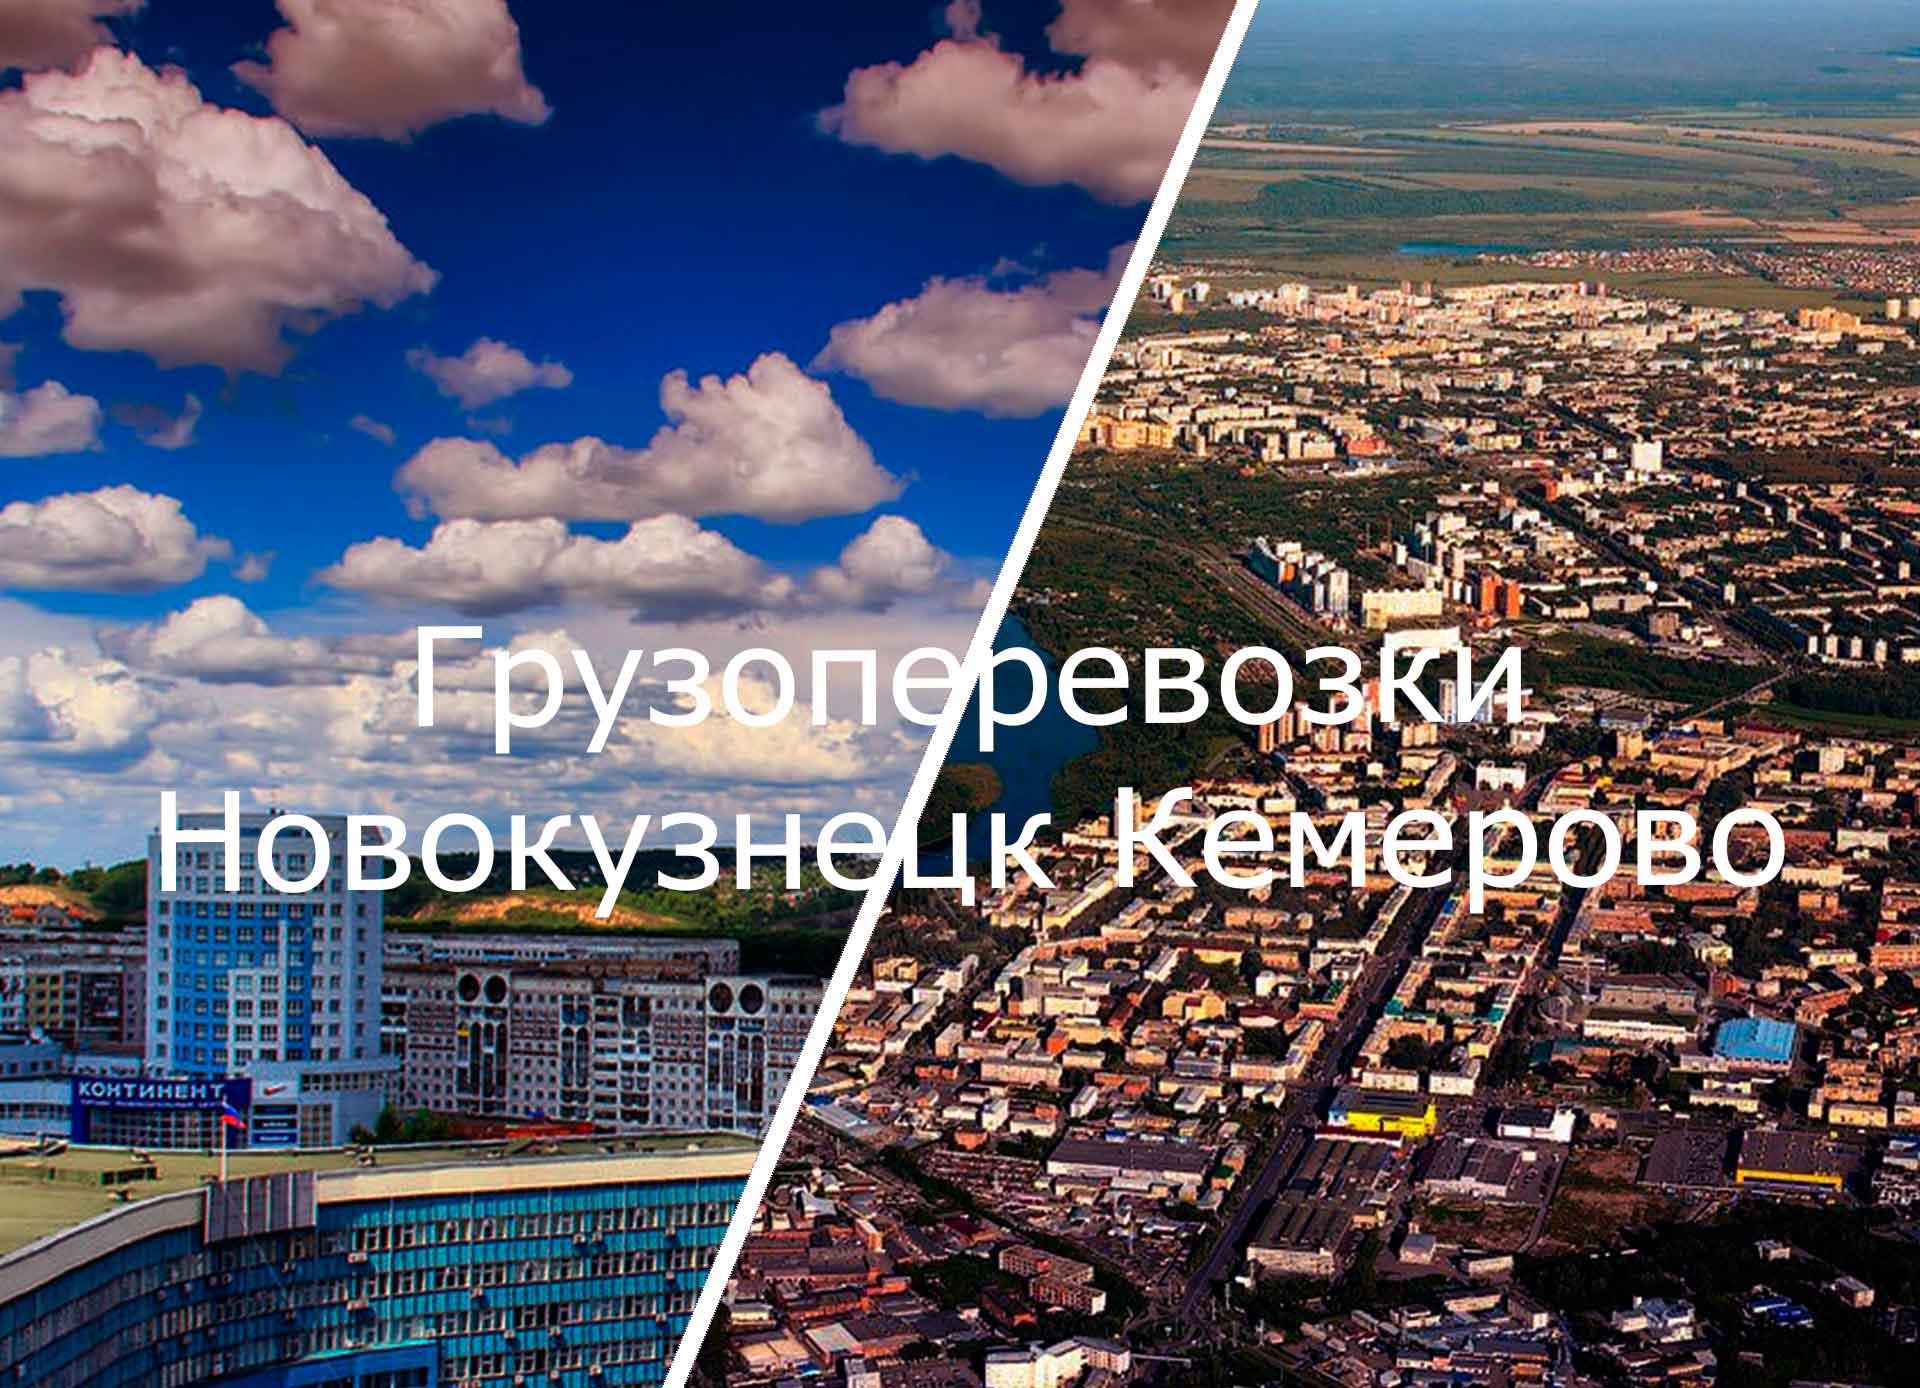 грузоперевозки новокузнецк кемерово